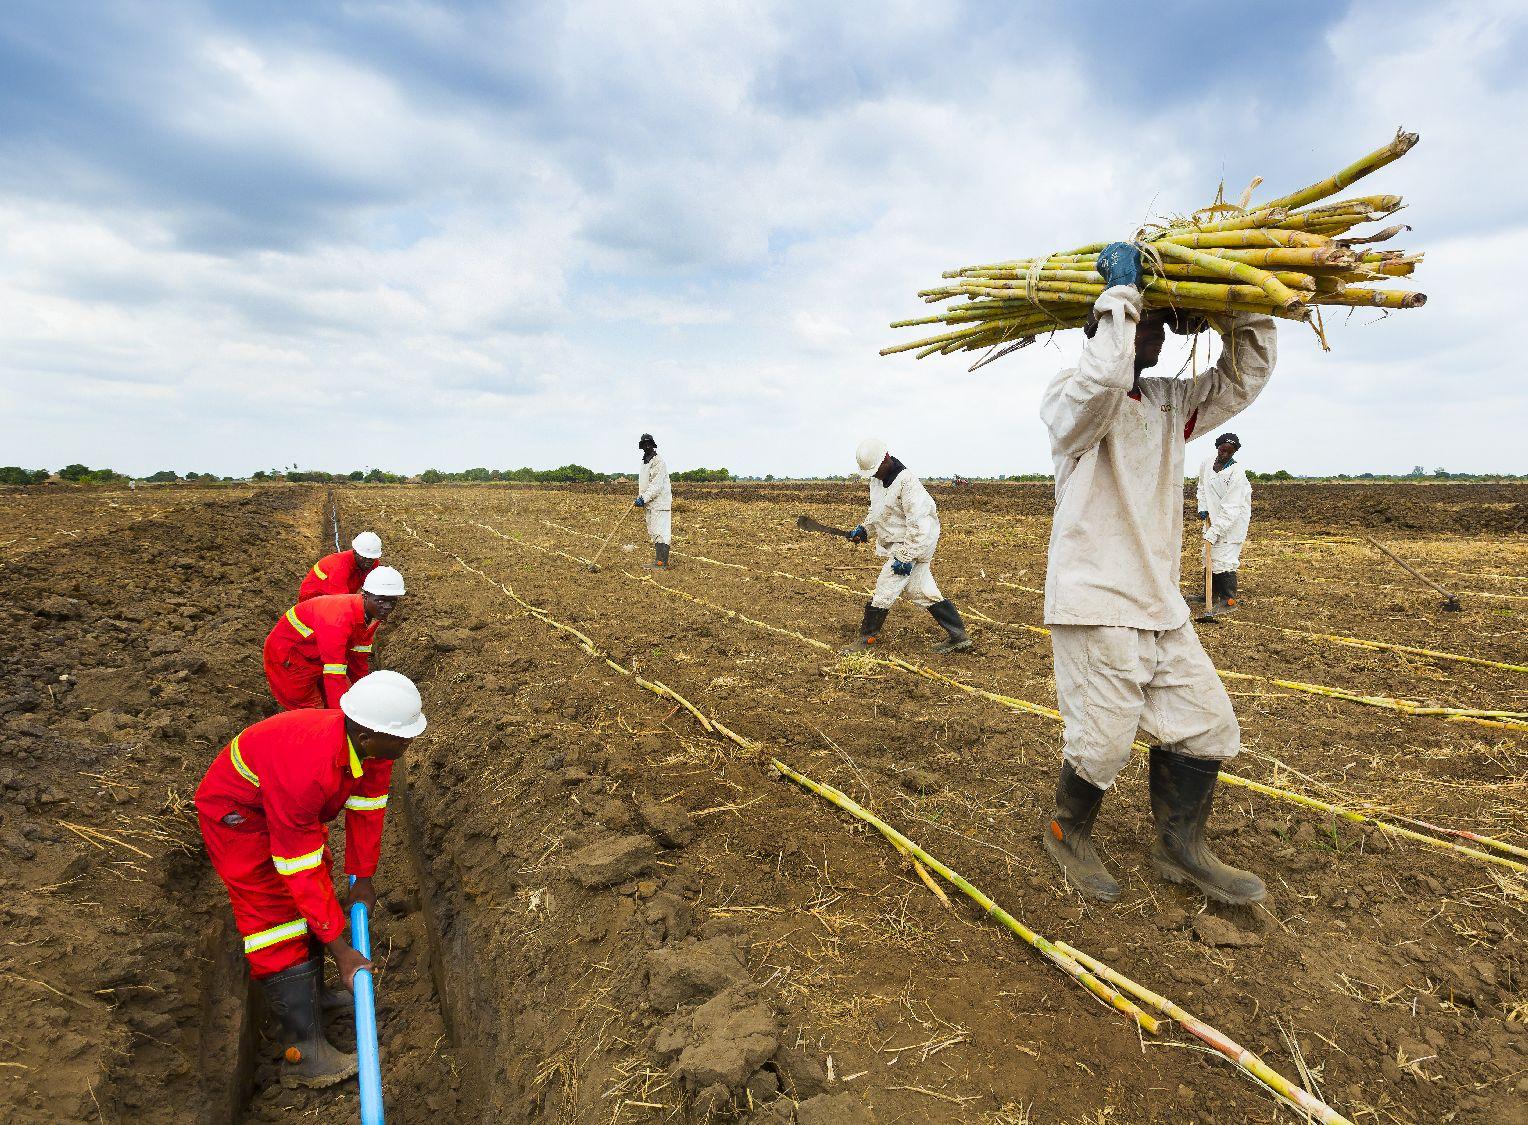 Sugar cane being planted